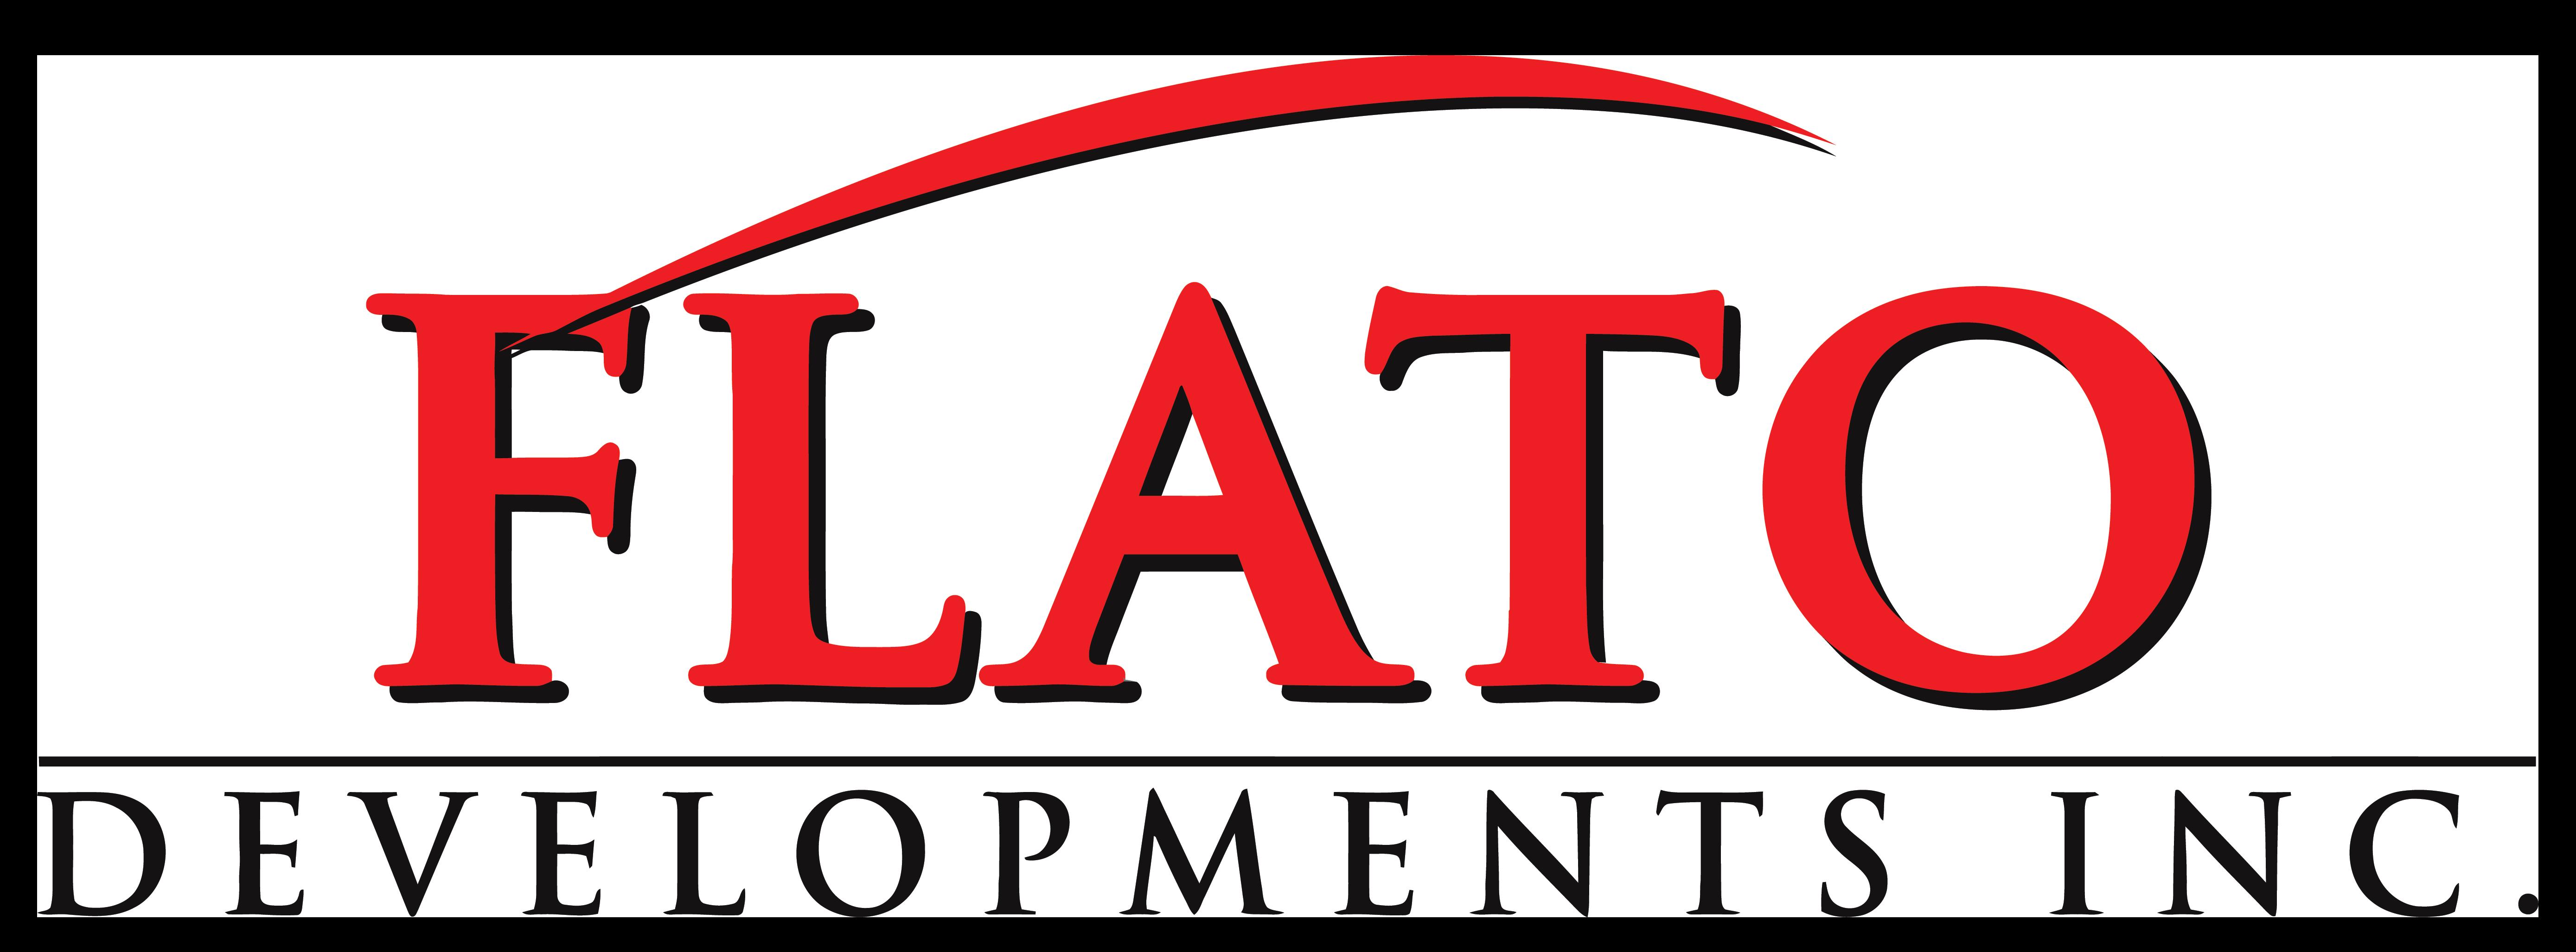 Flato Dev Logo - PNG